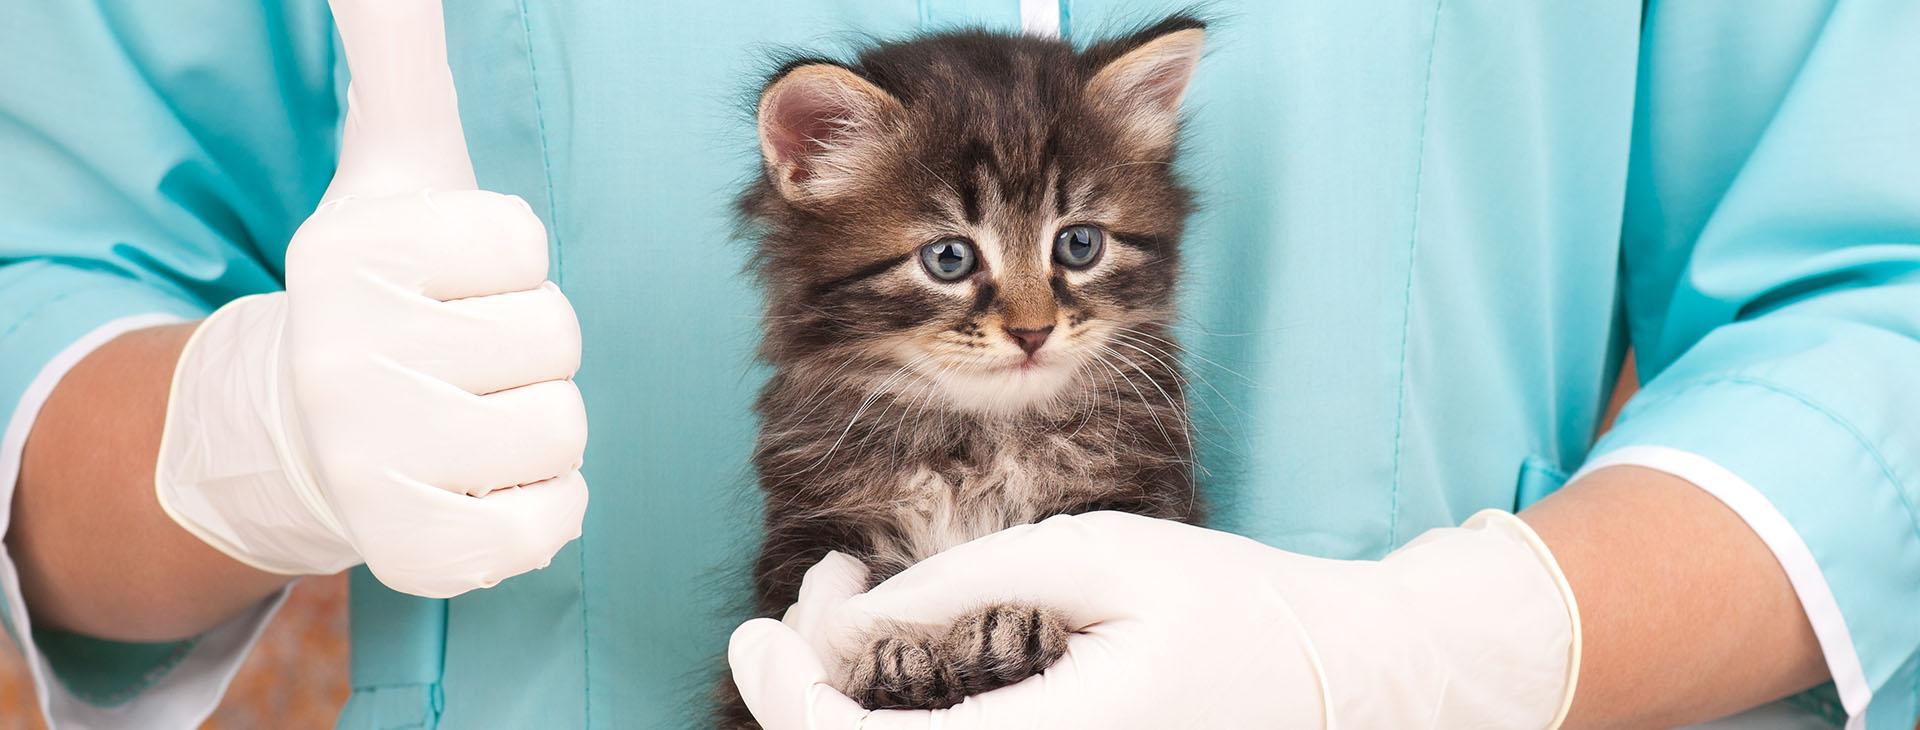 veterinarian holding kitten with thumbs up